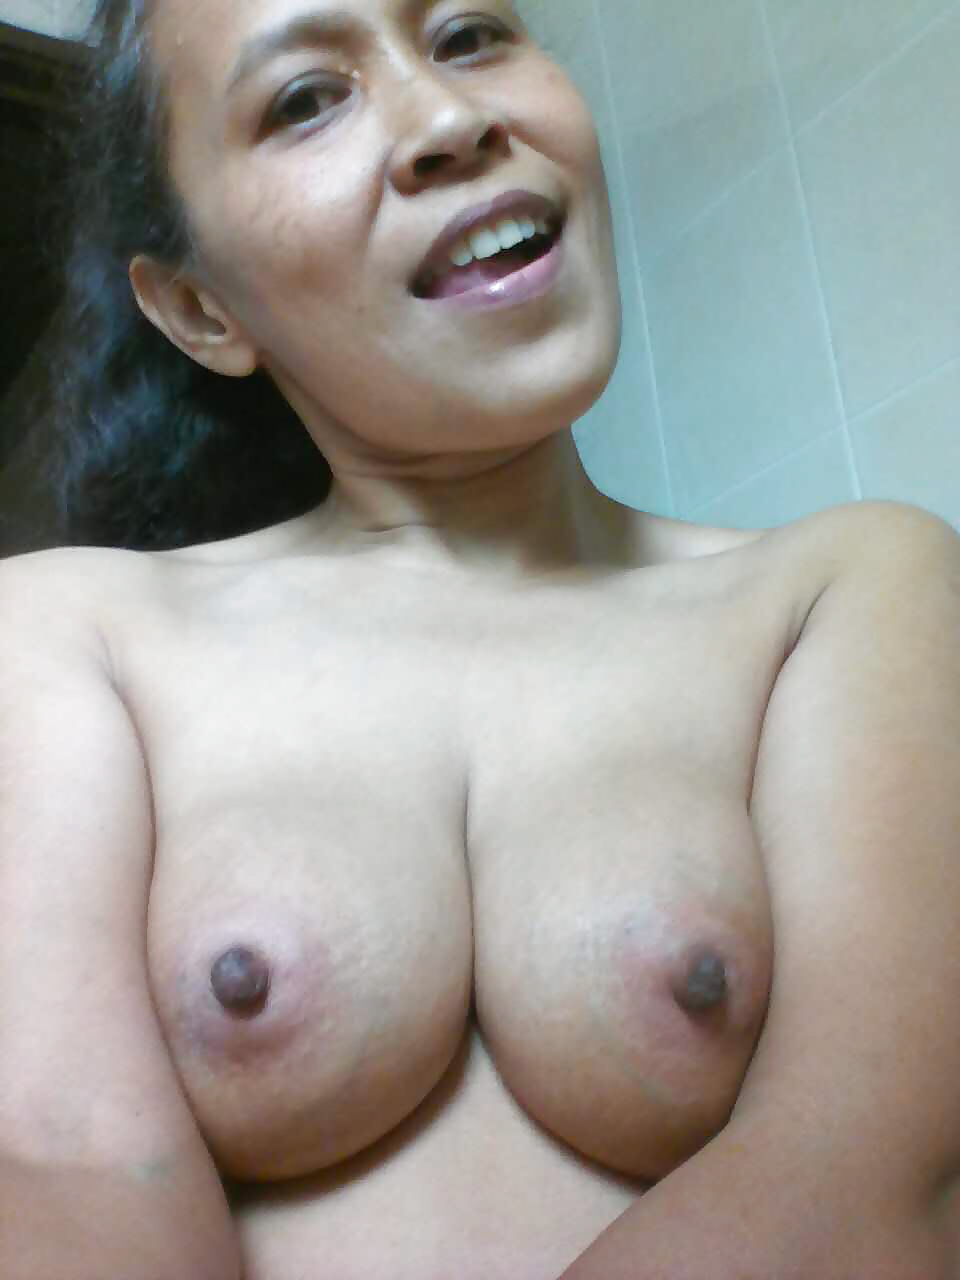 Malay bertudung pussy, sluty virgins